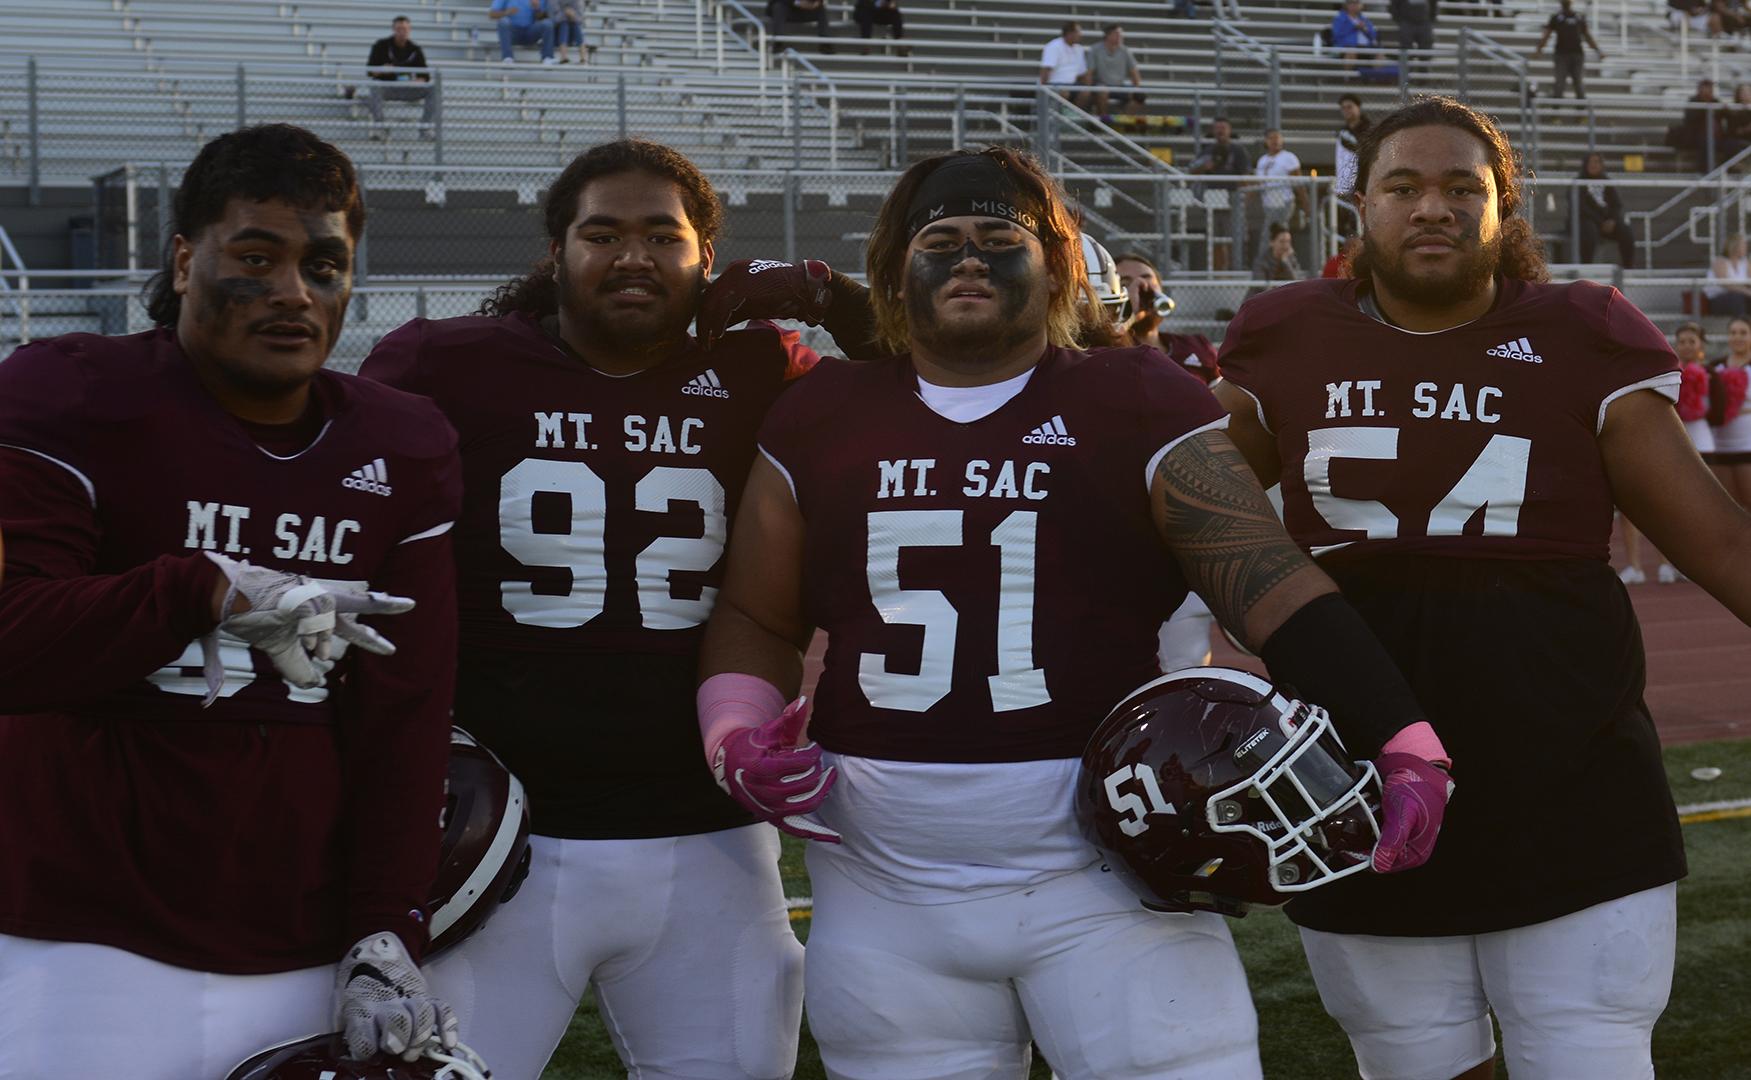 Left to right: Defensive linemen Eucharise J. Brown, Inoke Katoa, offensive linemen Tony Aiono Jr. and defensive lineman Tevita Fuimaono. Photo credit: Mychal Corbin/SAC.Media